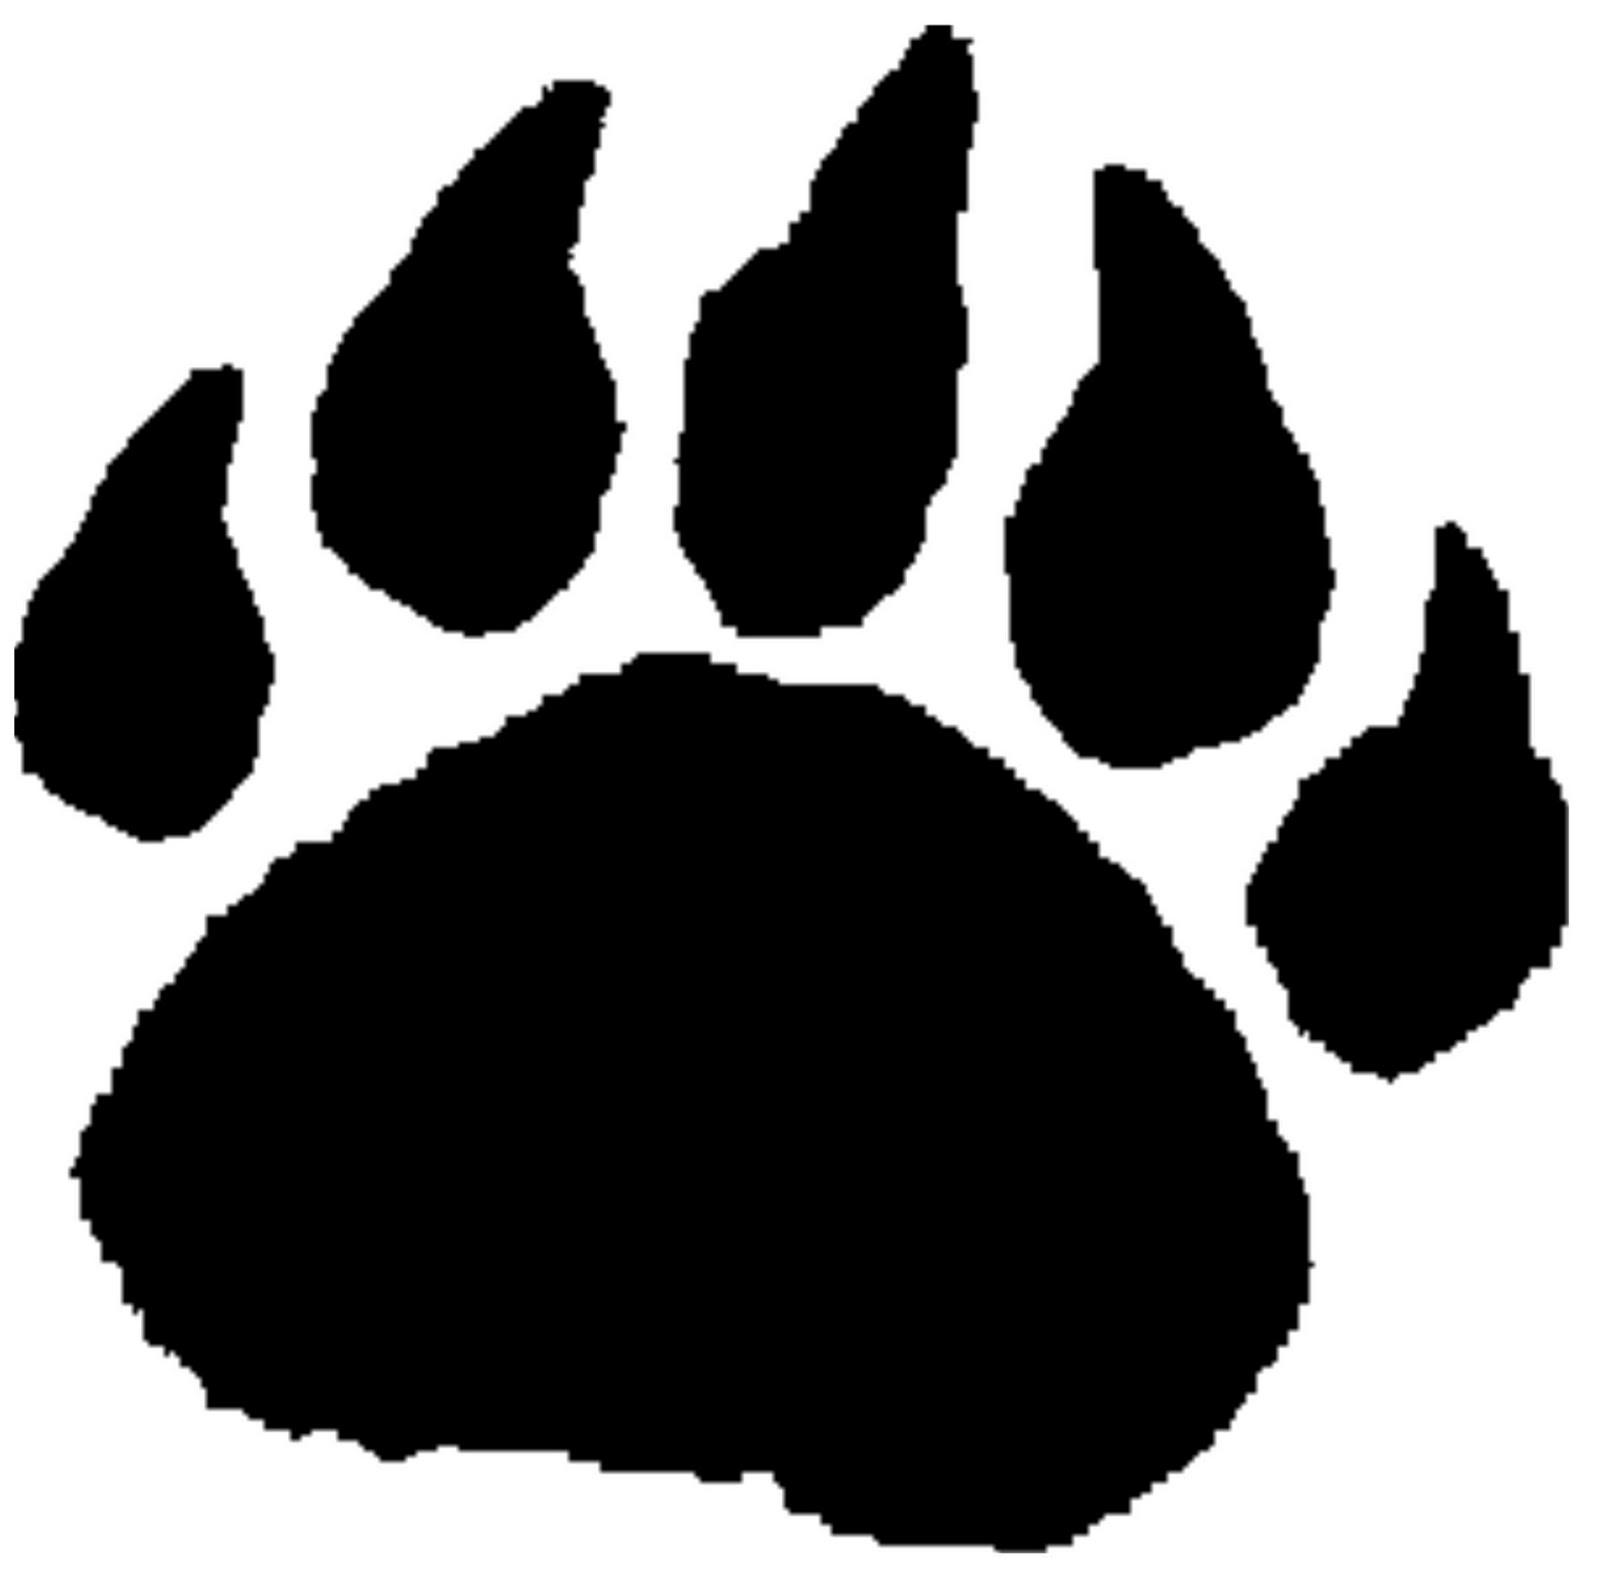 pin bear paw clip art on clipart panda free clipart images rh clipartpanda com polar bear paw clip art bear paw border clip art